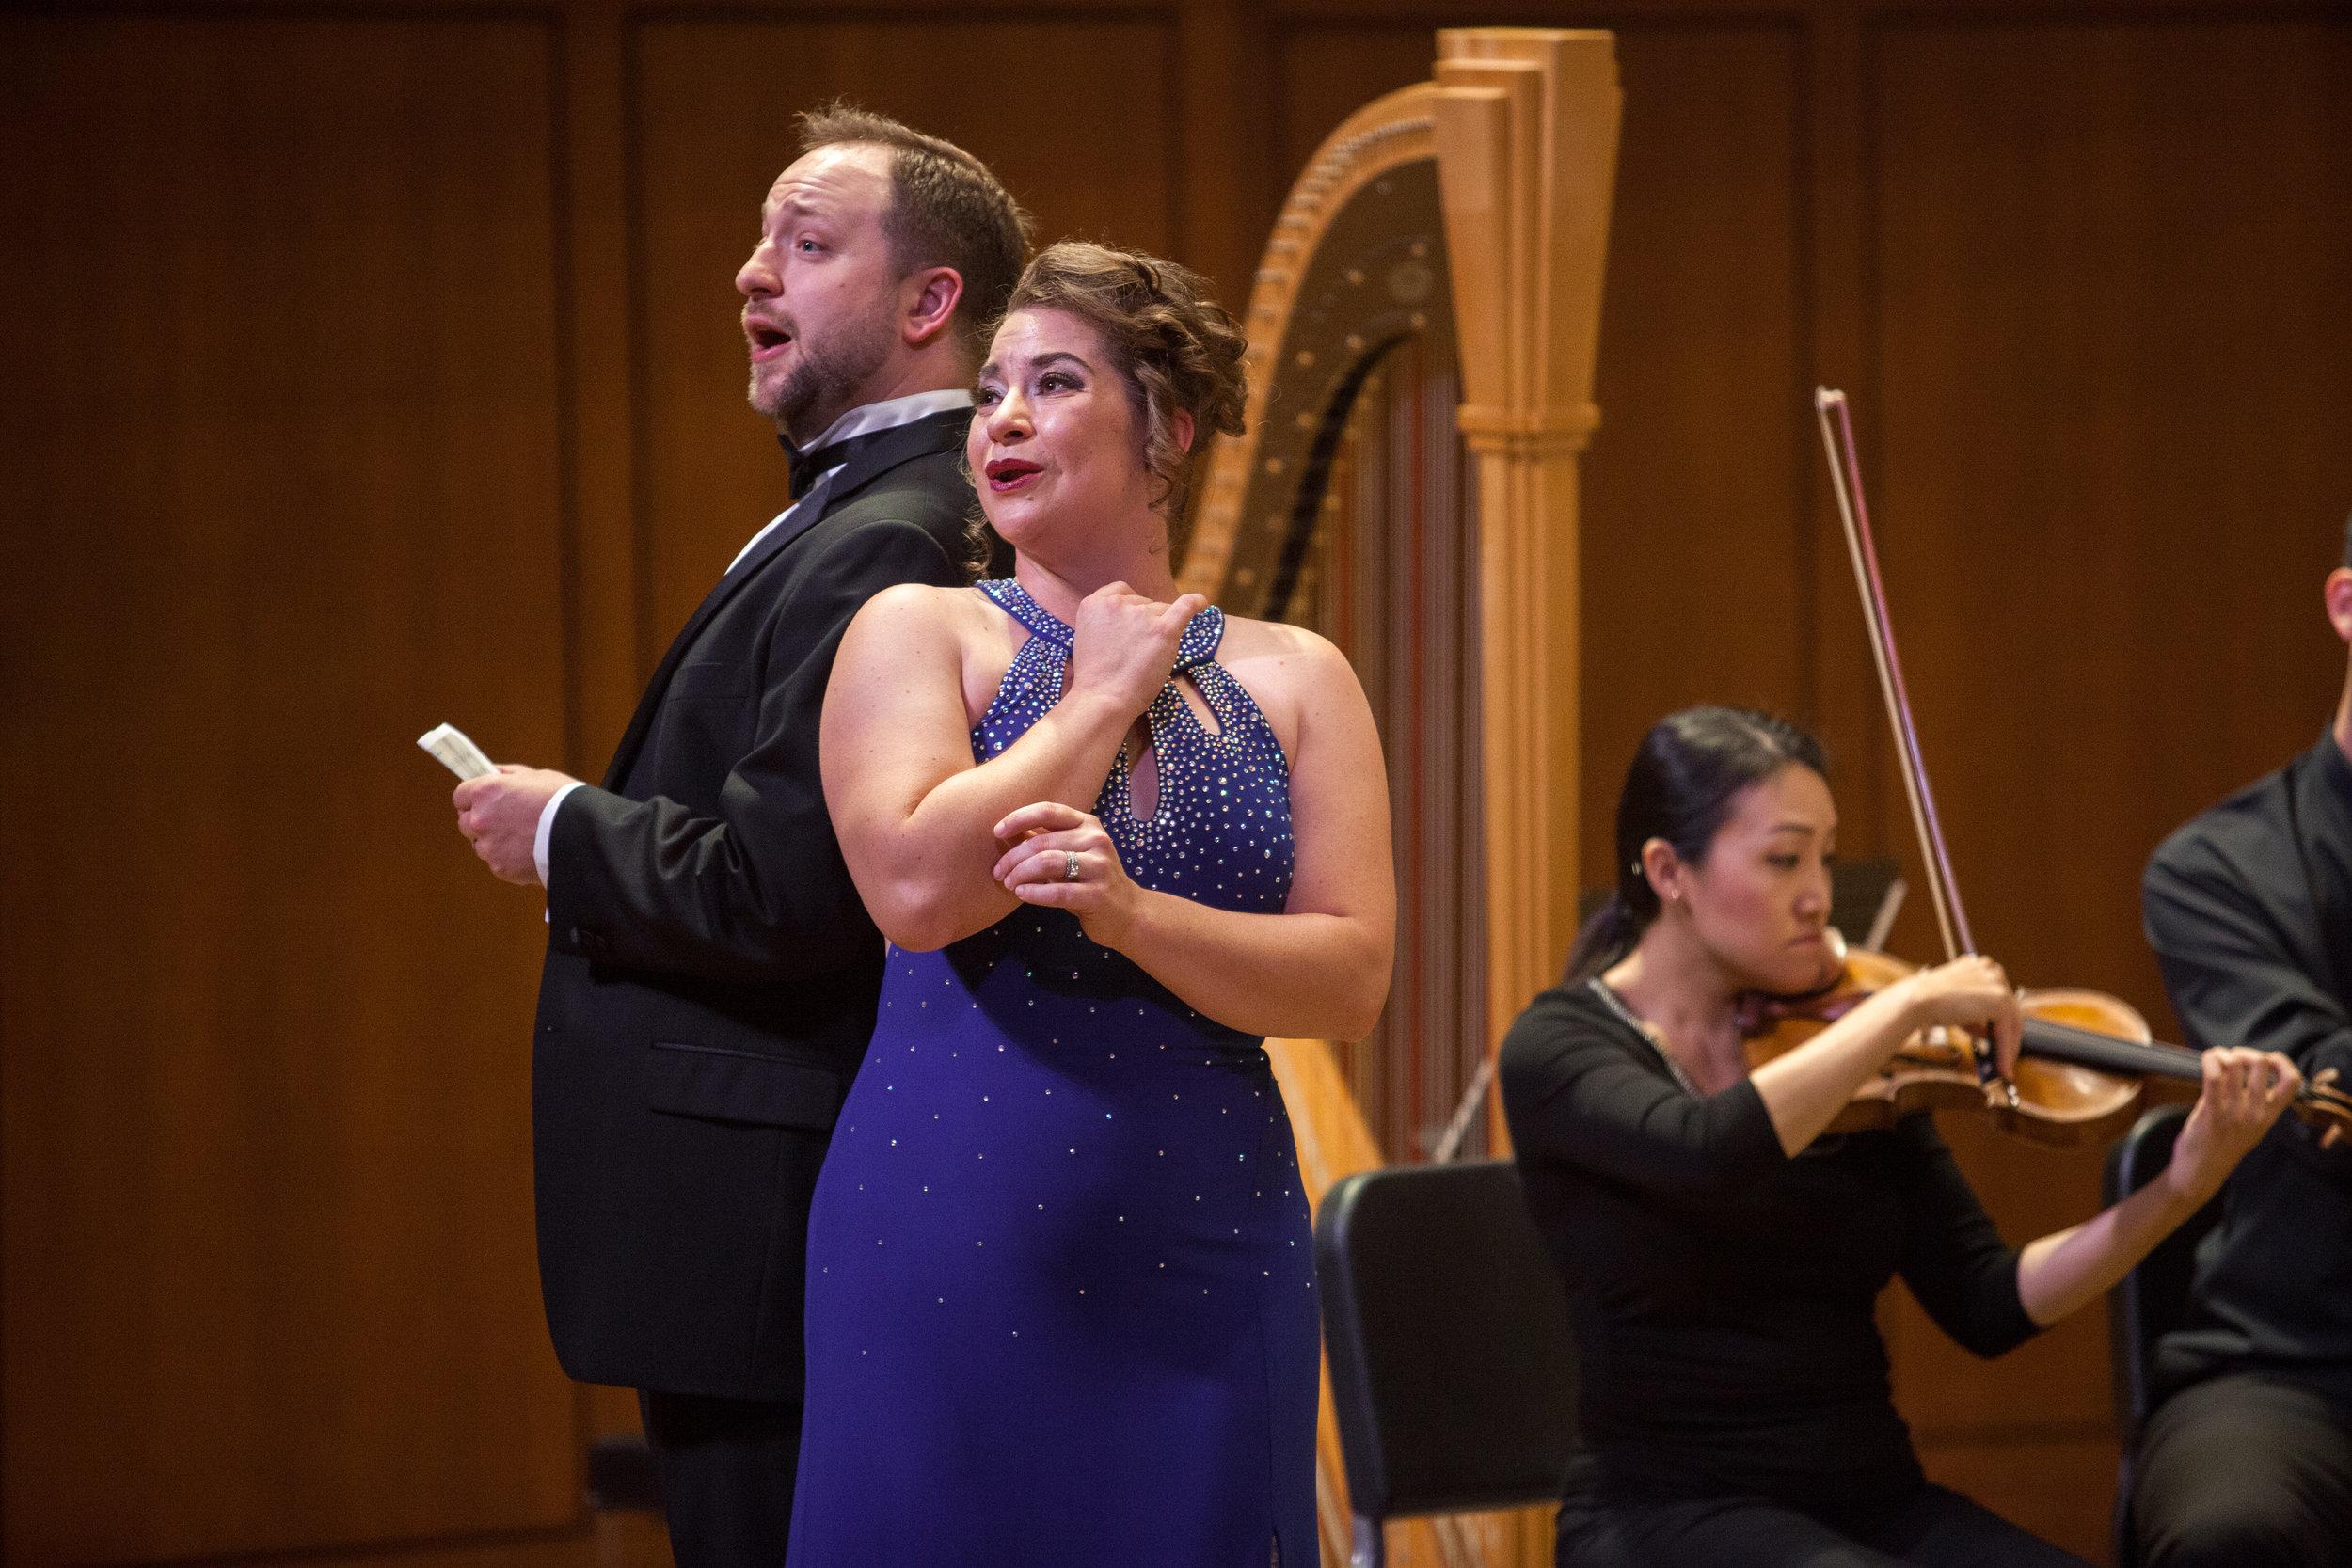 Ellie Jarrett-Shattles, mezzo-soprano, and Benjamin Cox, baritone performing a duet.